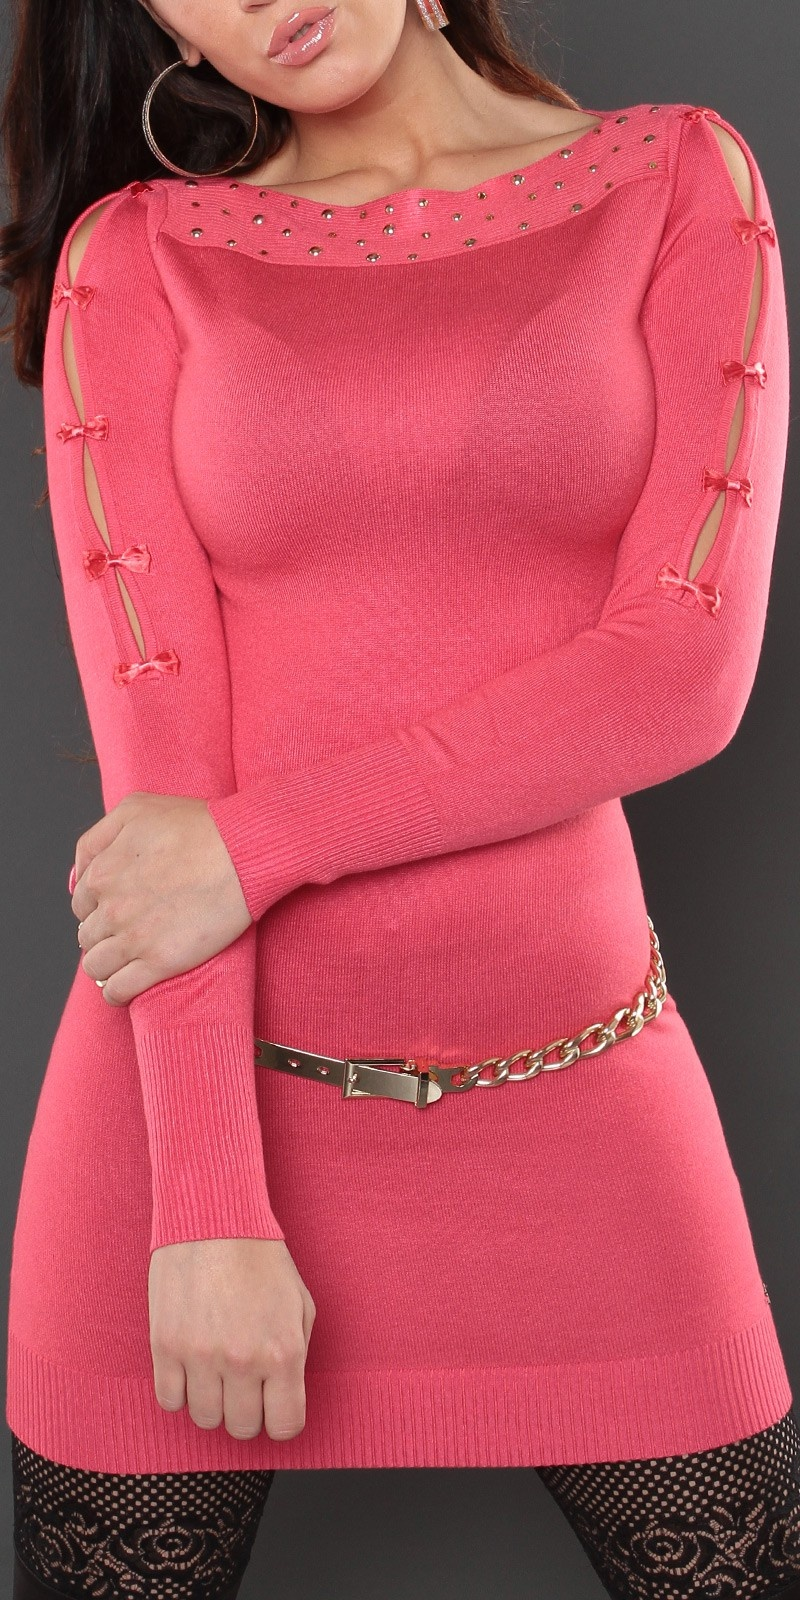 Sexy lange sweater-trui met strikjes koraal-kleurig